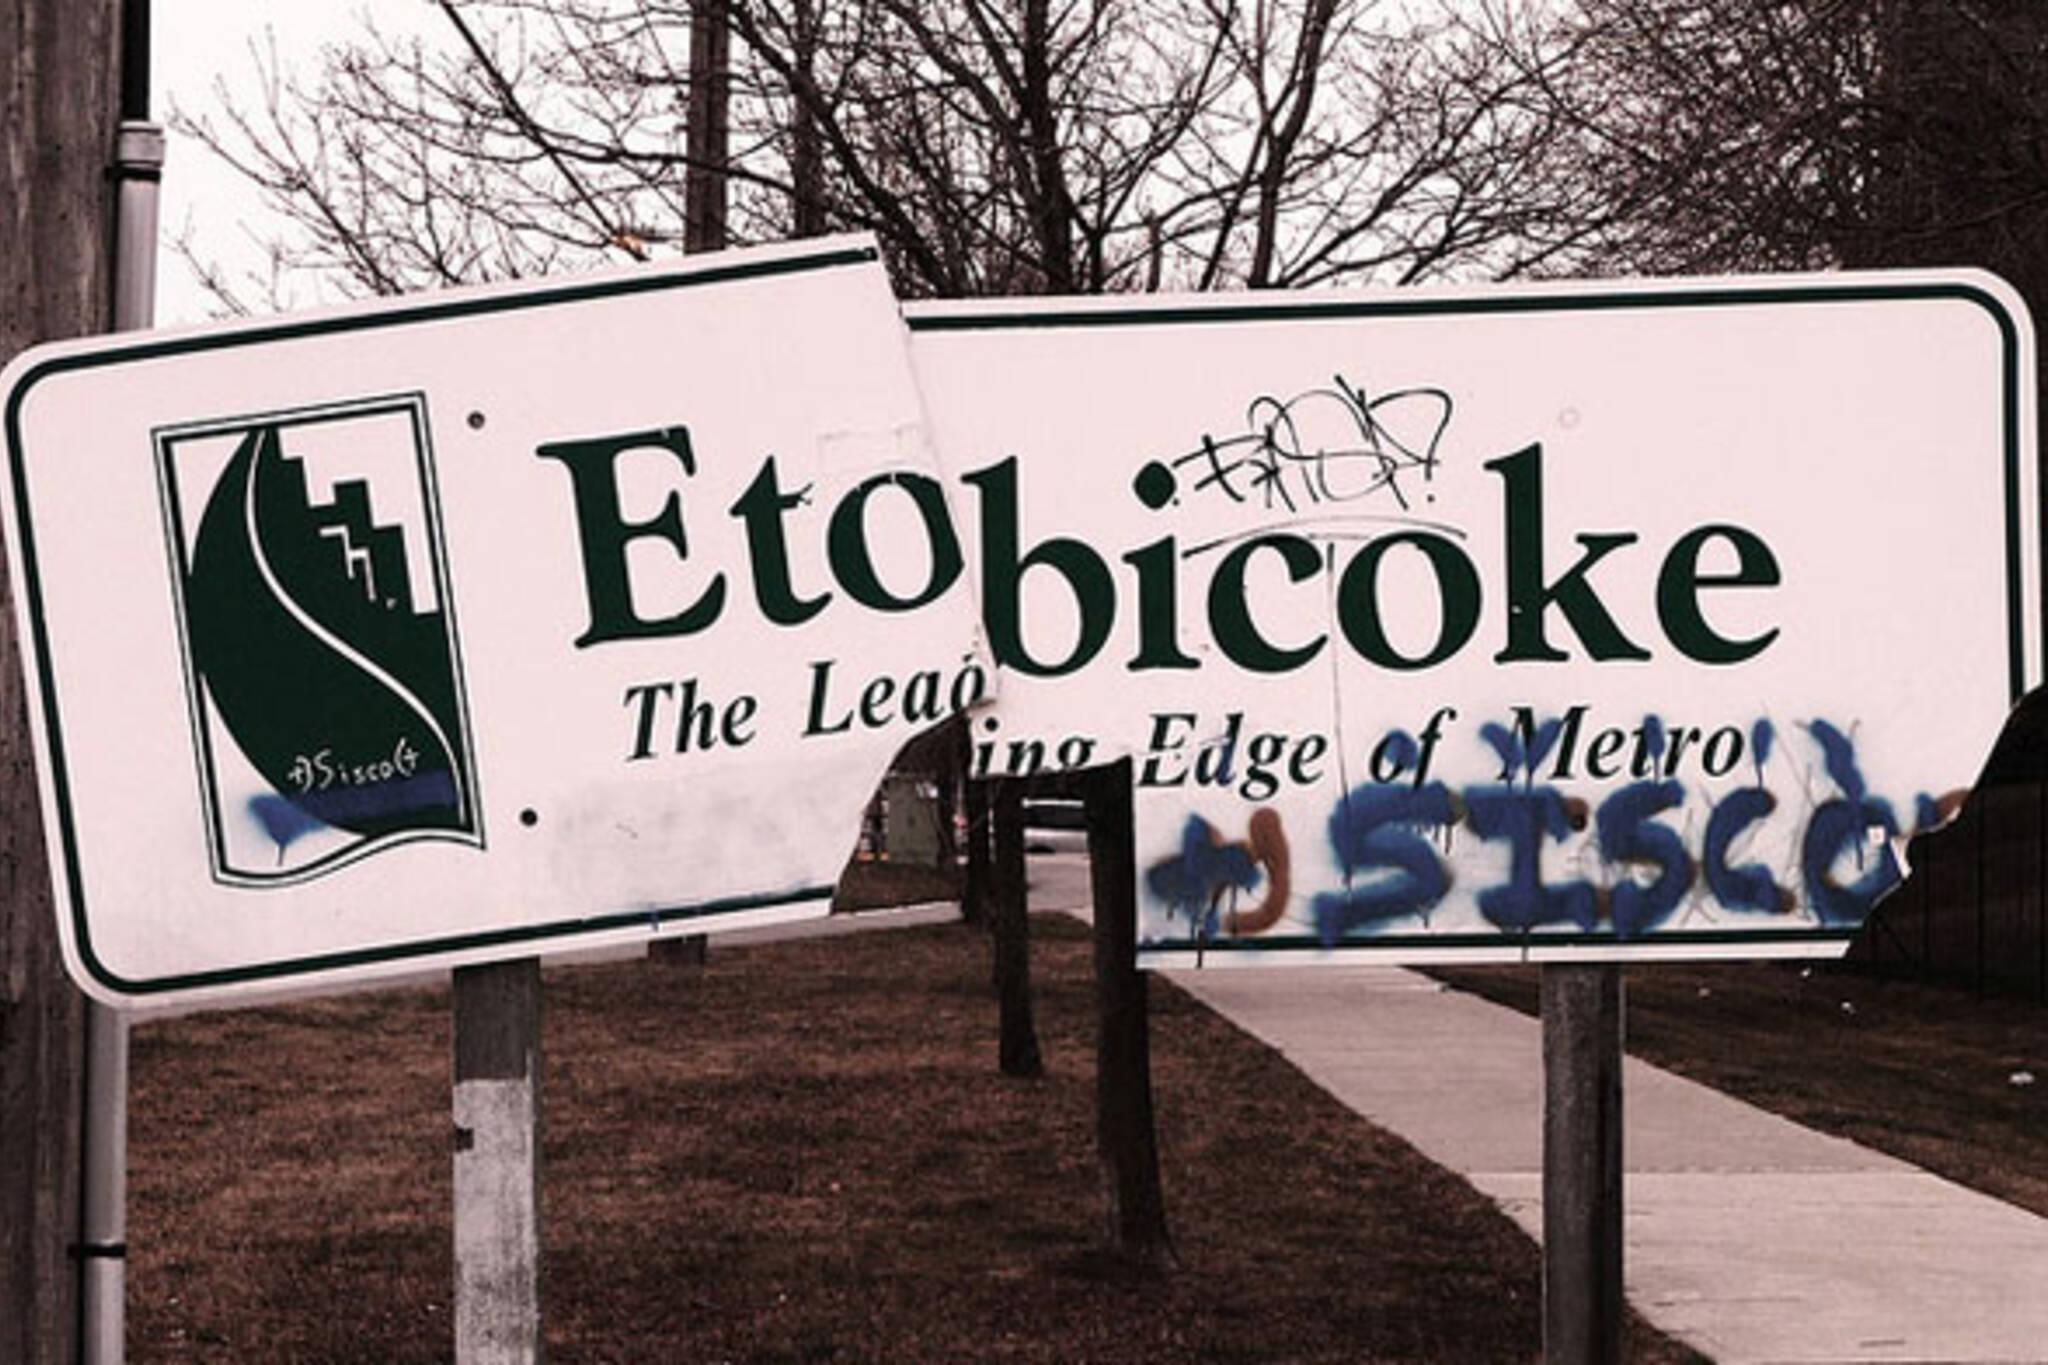 Etobicoke